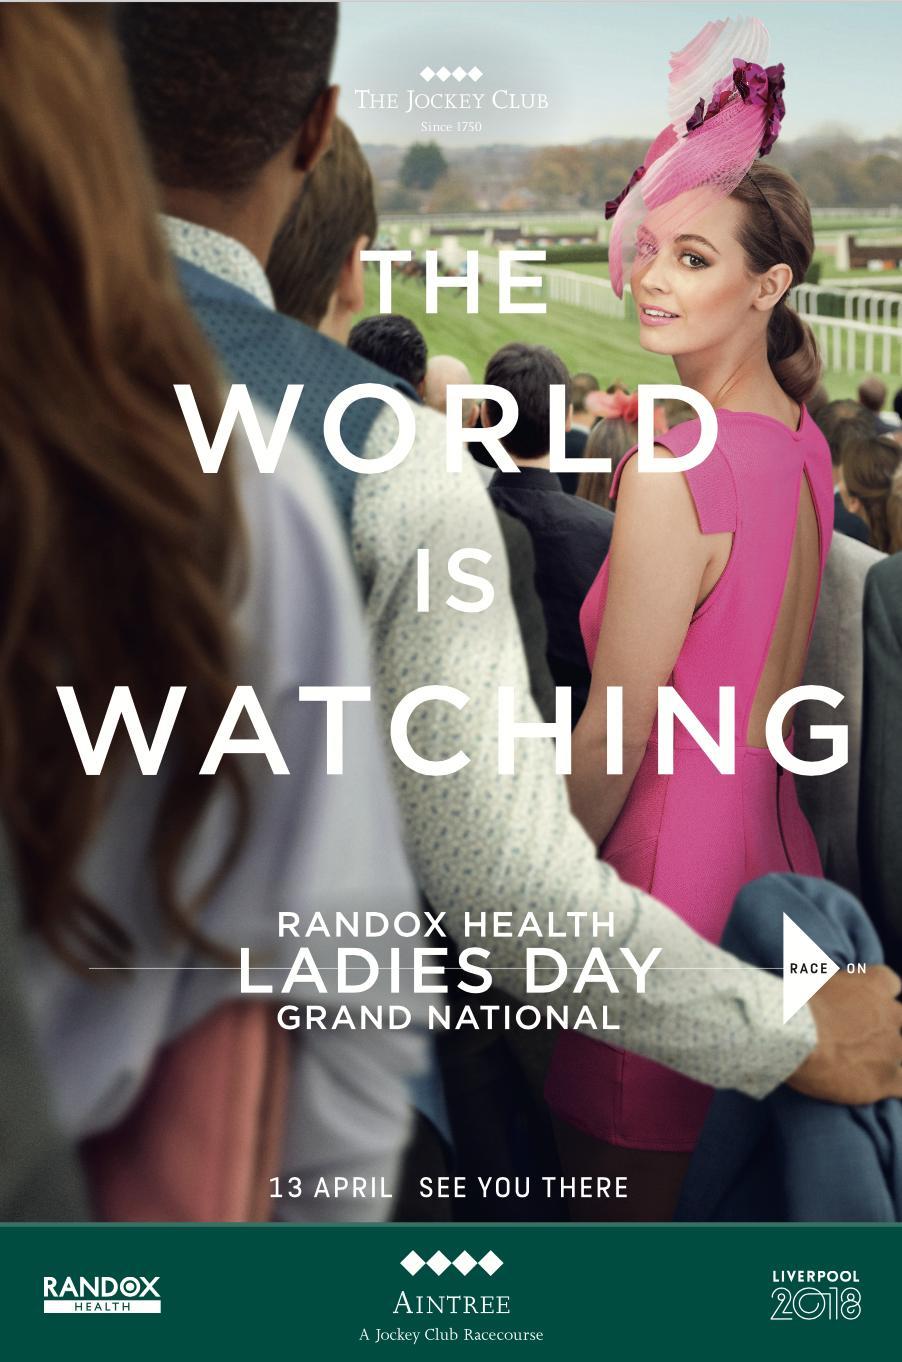 Randox Grand National Ladies Day